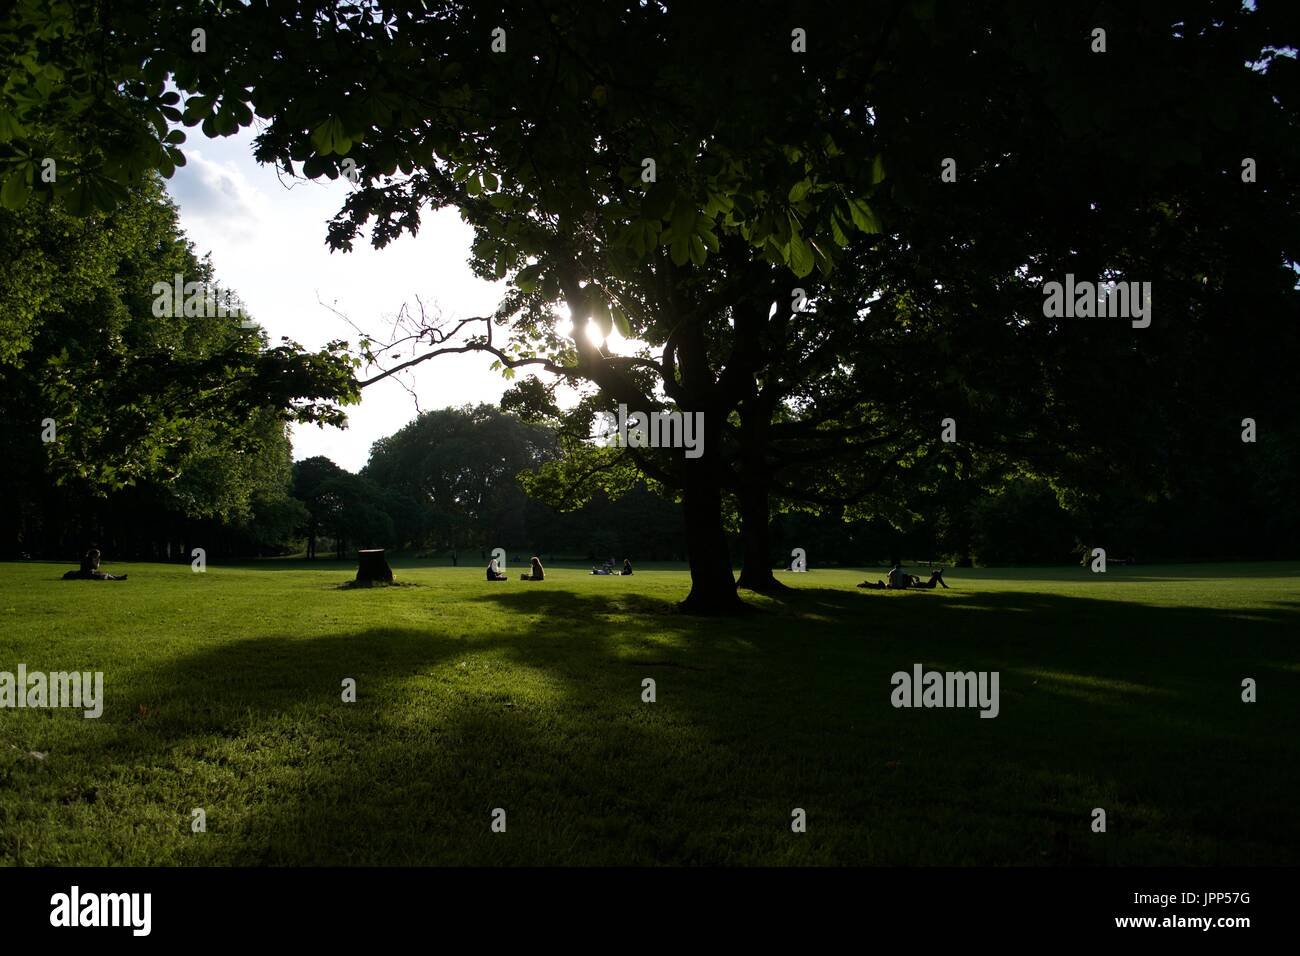 London Parks - Primrose Hill - UK - Stock Image